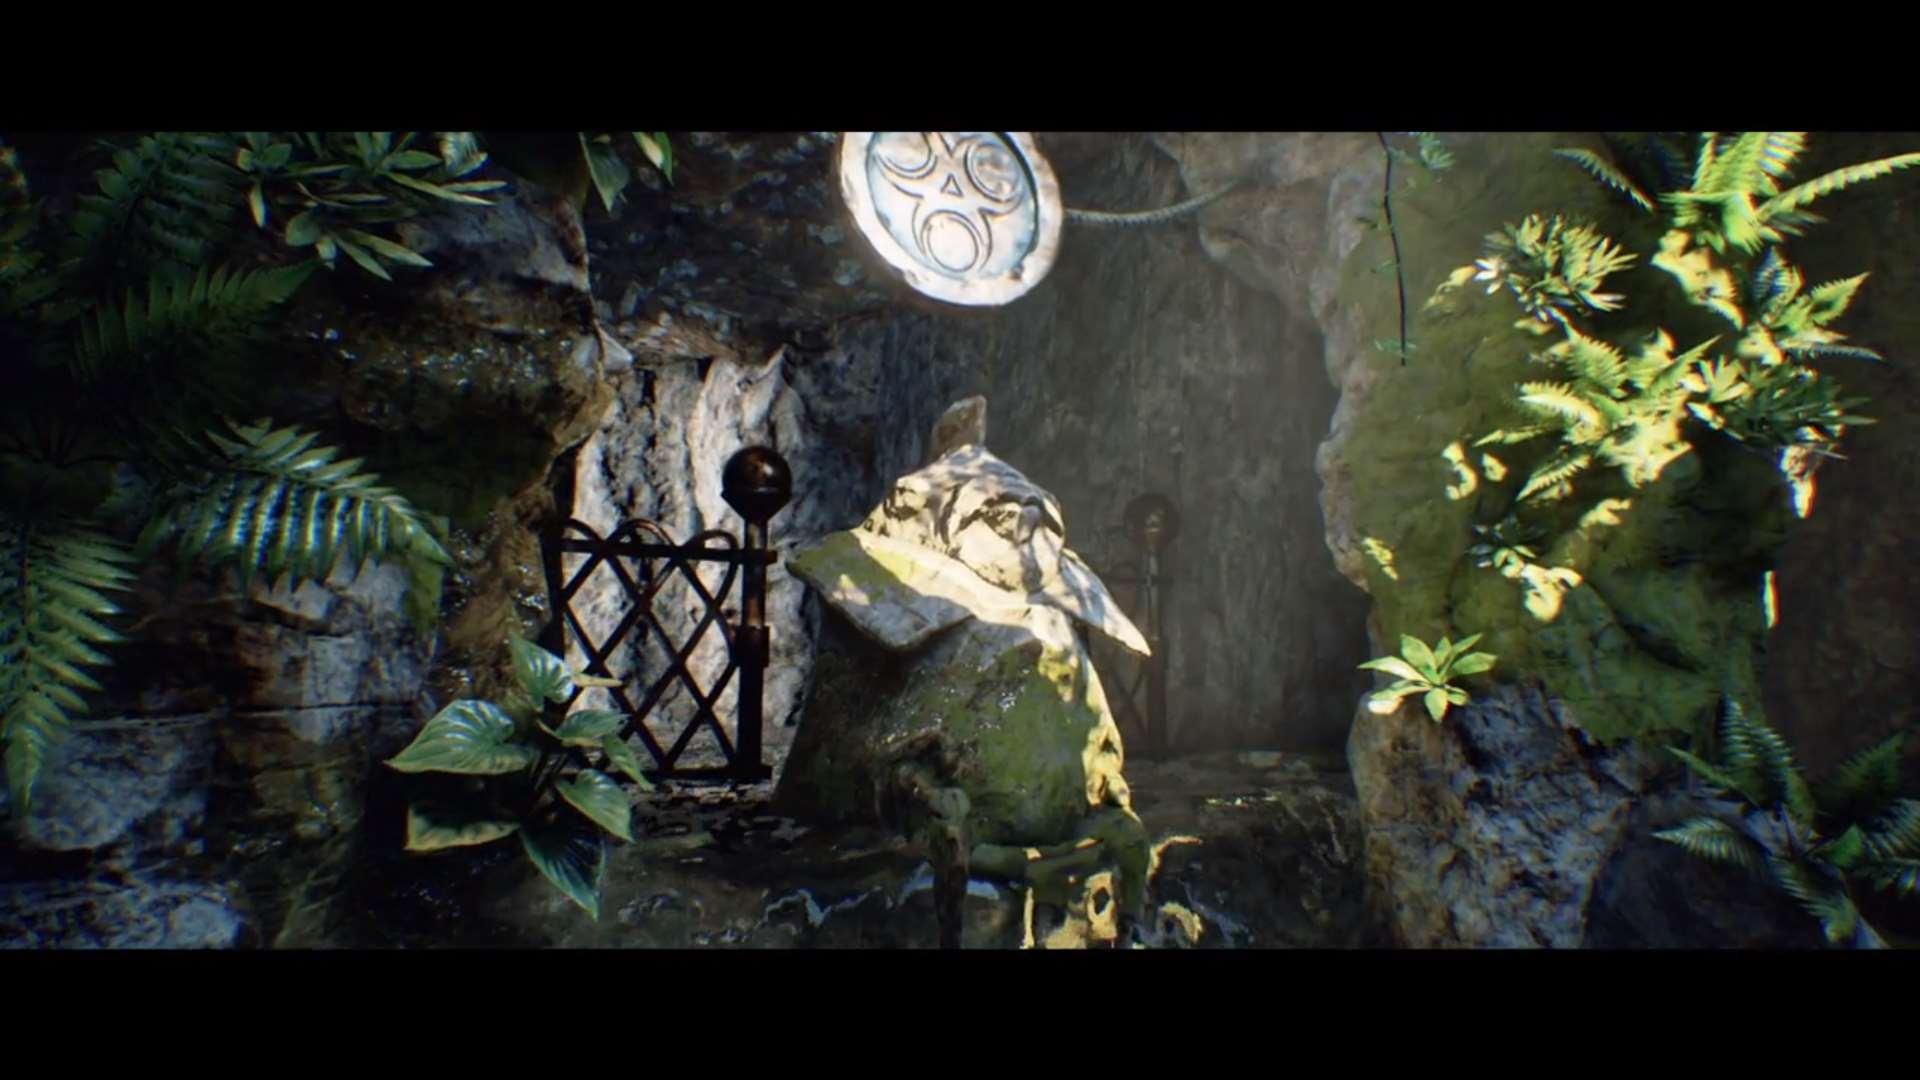 c7888128cdb7  Legend Of Zelda  Ocarina Of Time  Redone With Unreal Engine 4 Looks  Fantastic